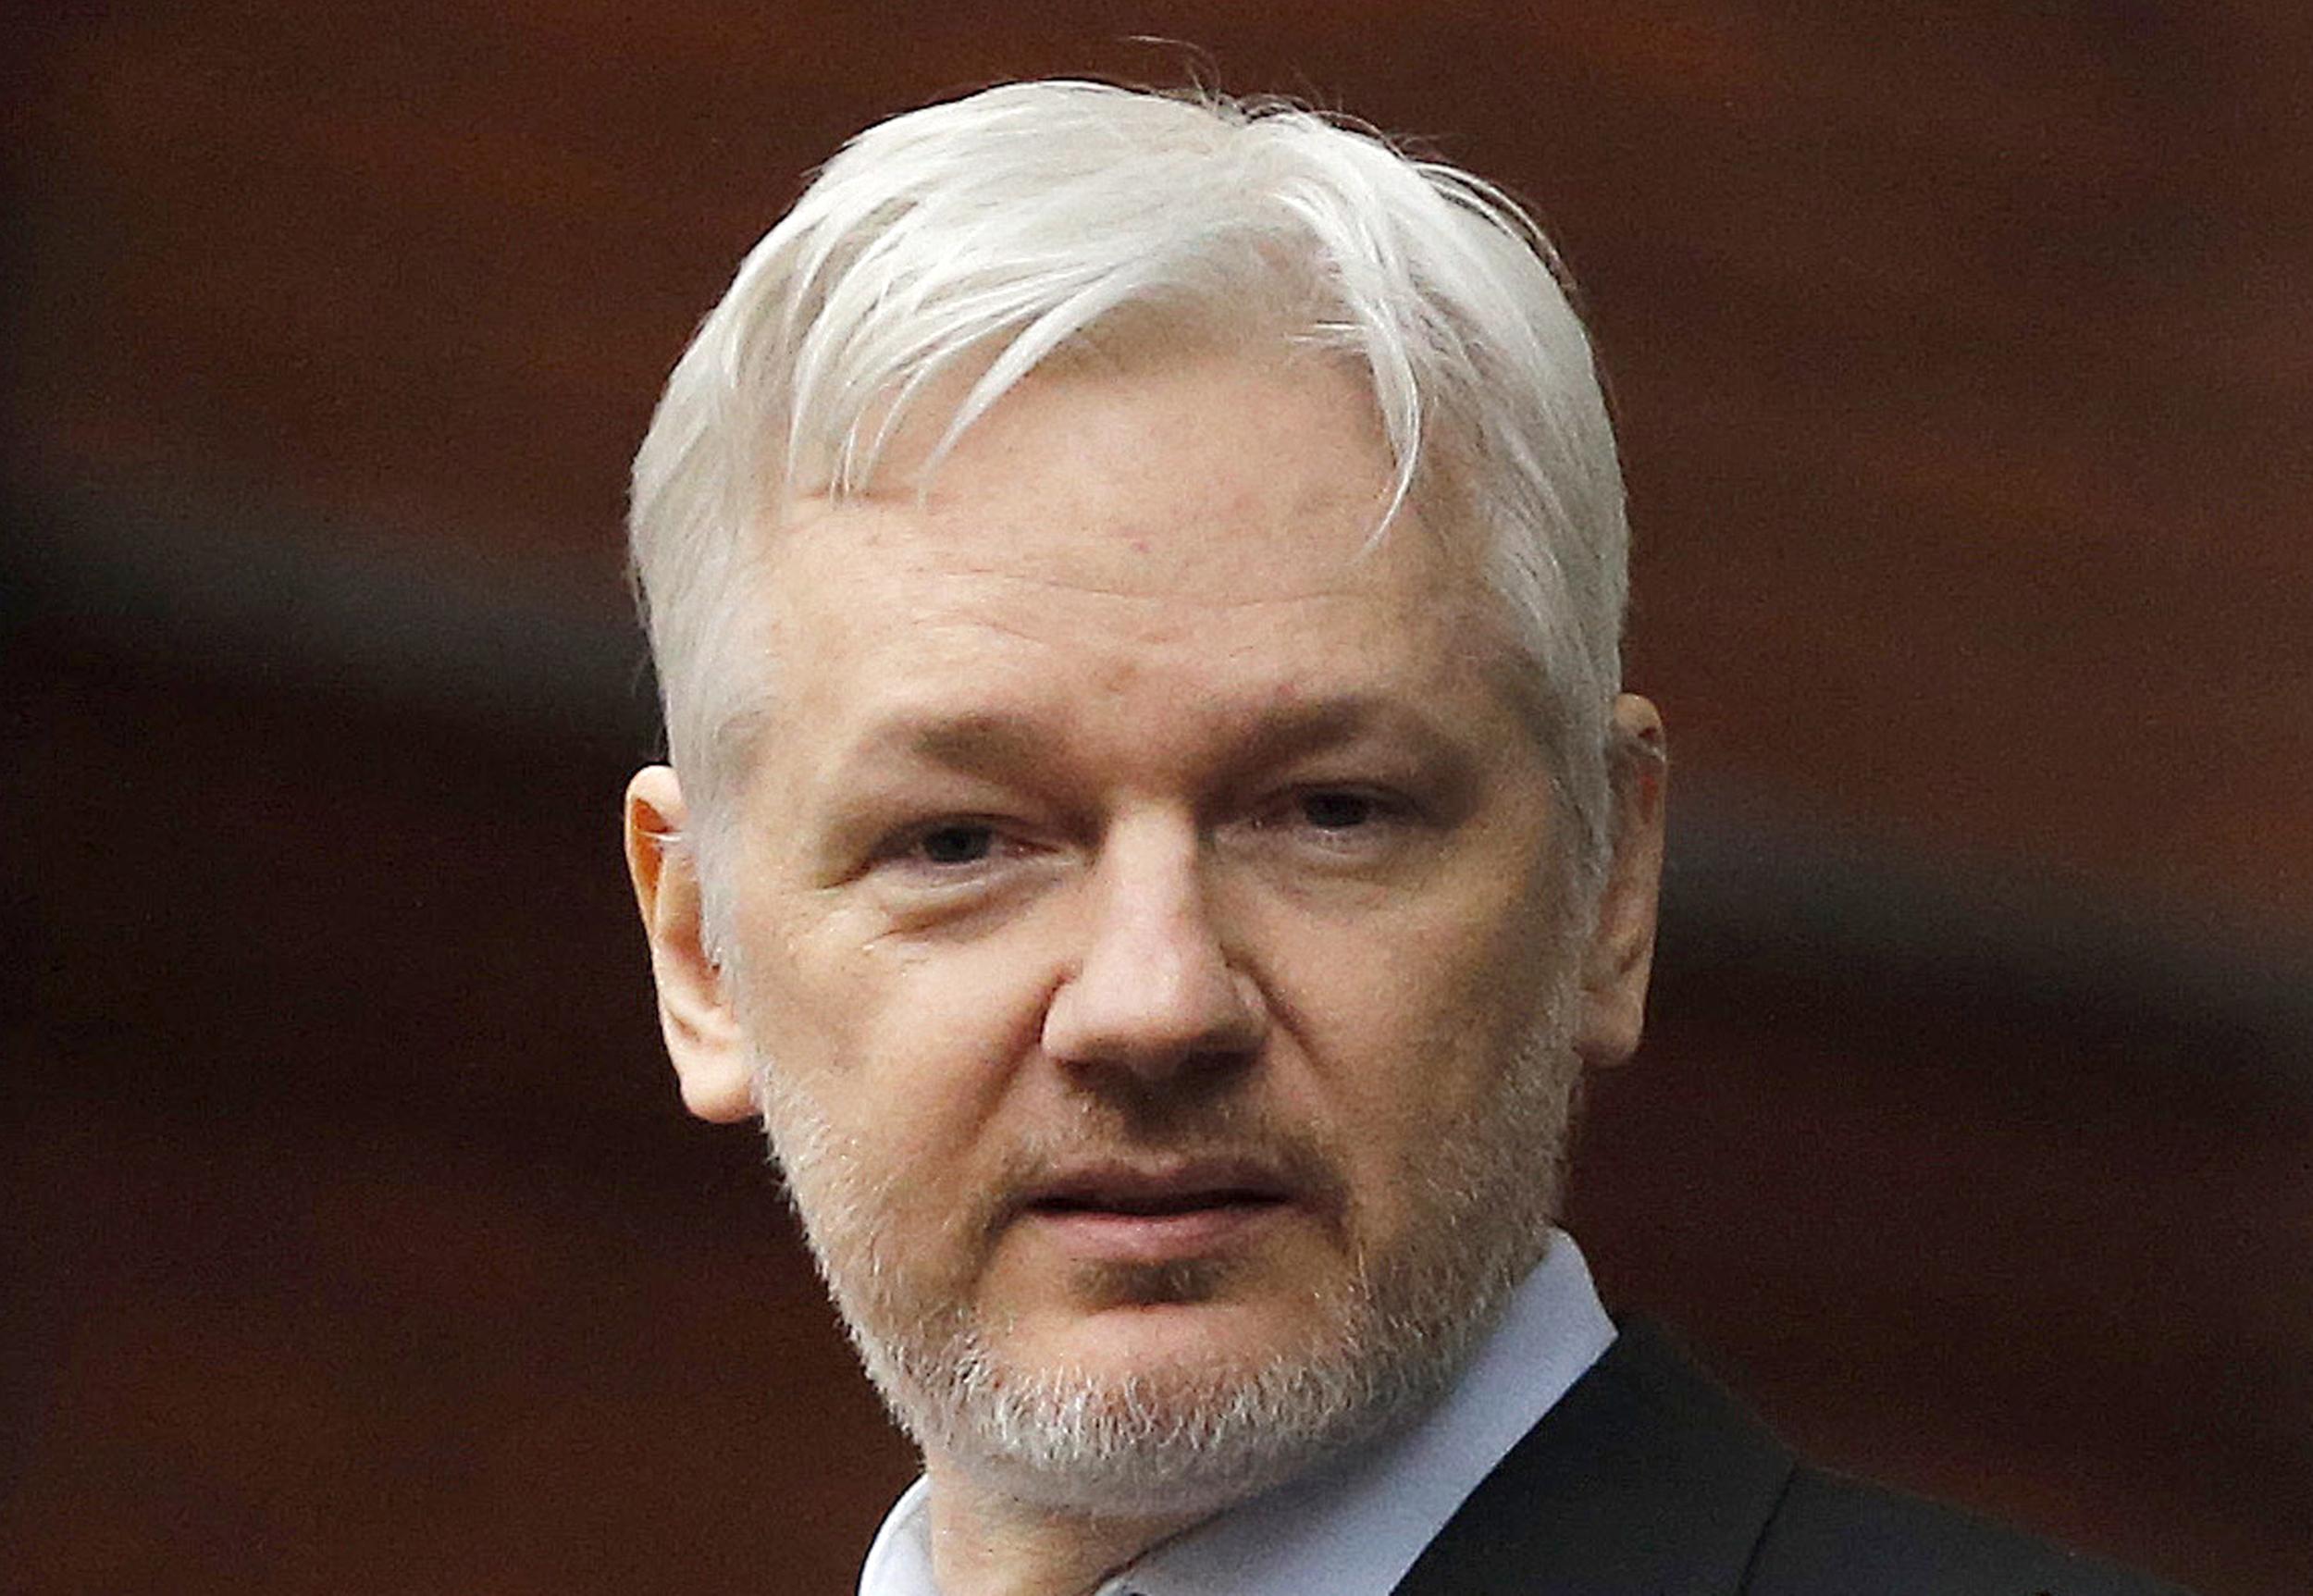 U.S. Urged Ecuador to Act Against WikiLeaks' Assange